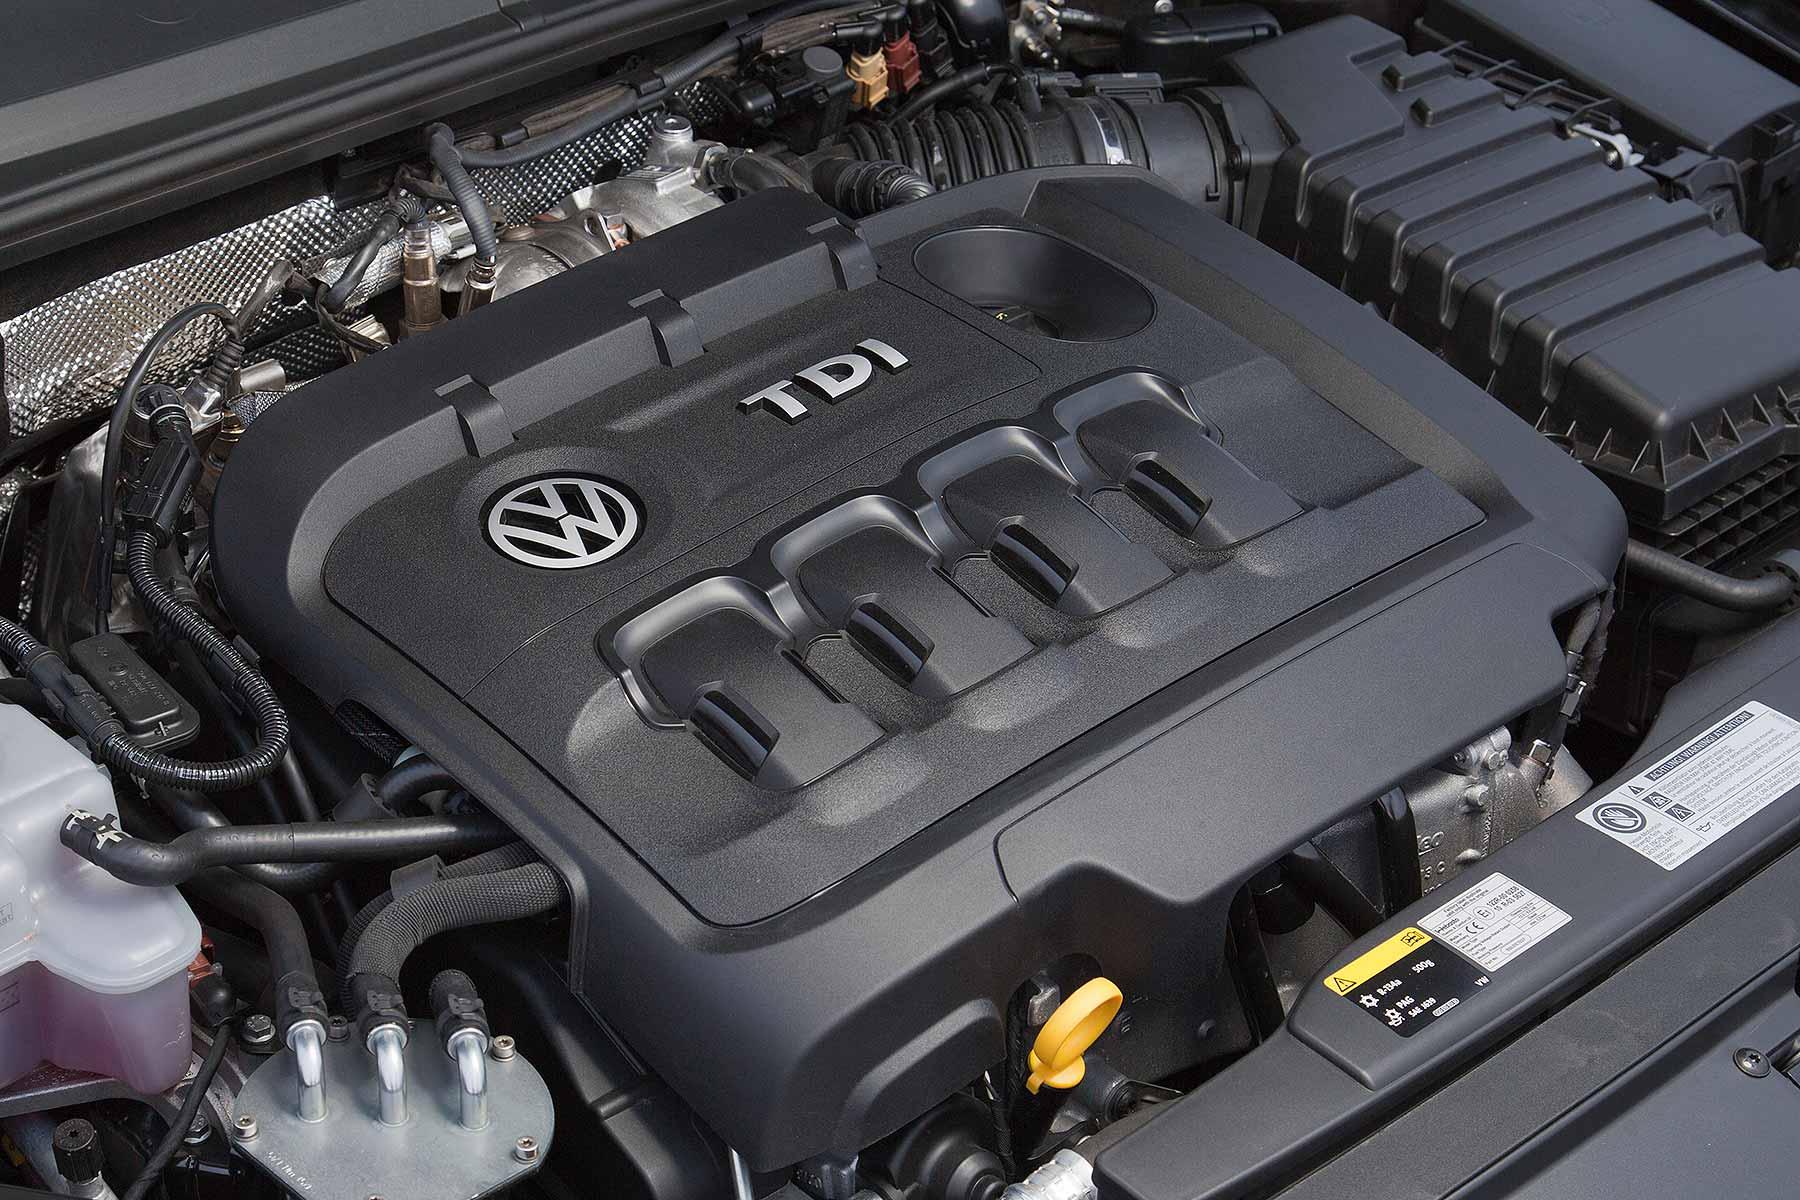 2.0-litre TDI engine